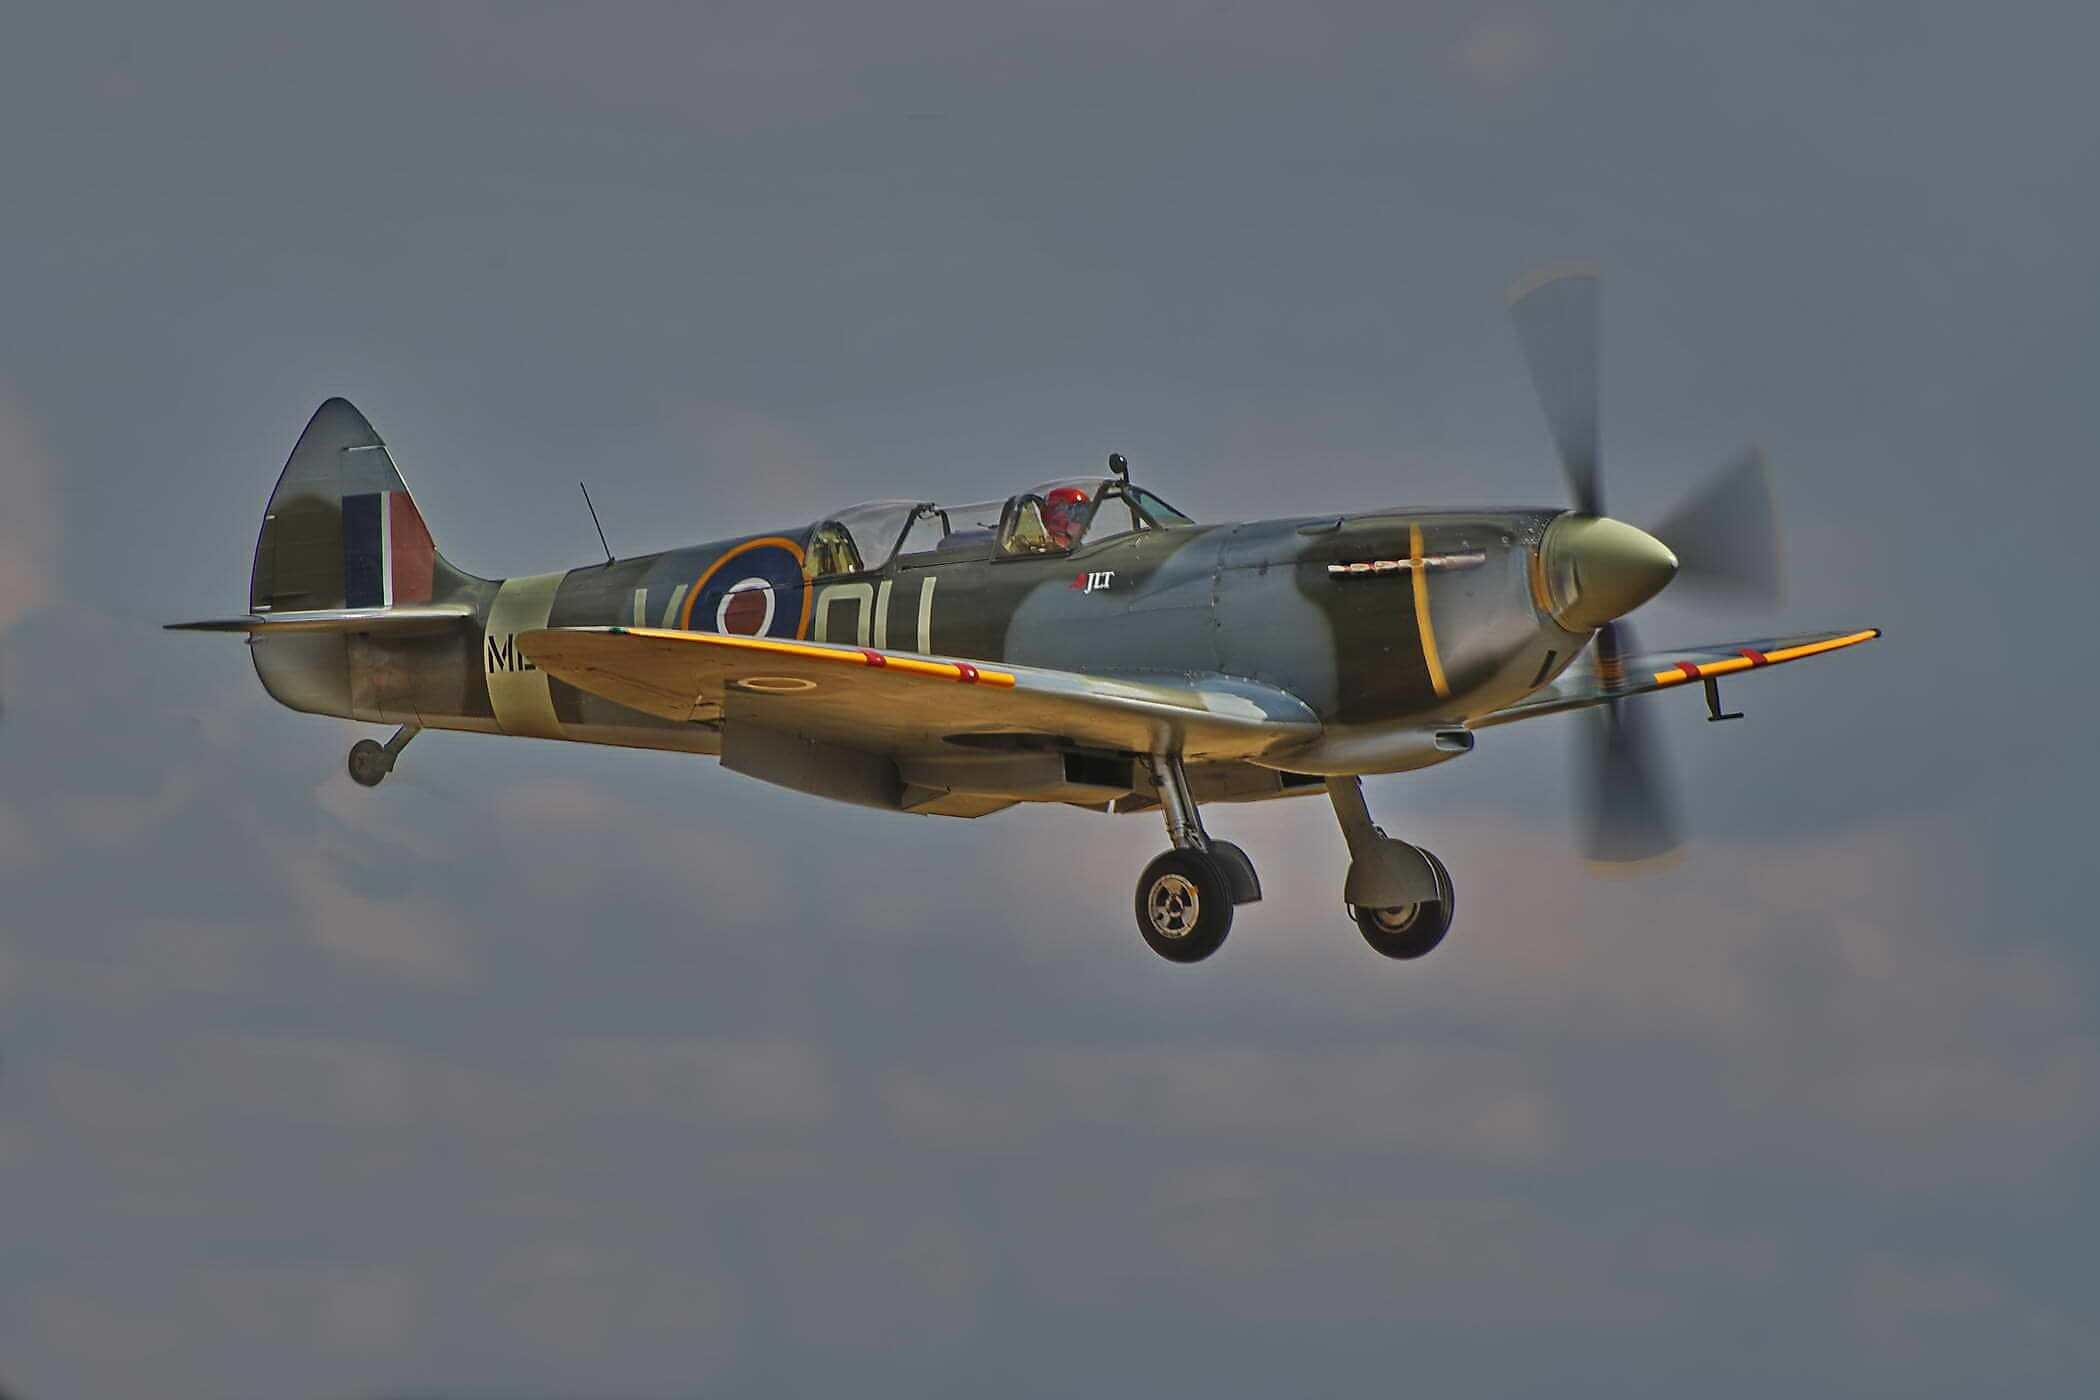 Spitfire TR 9 ML407